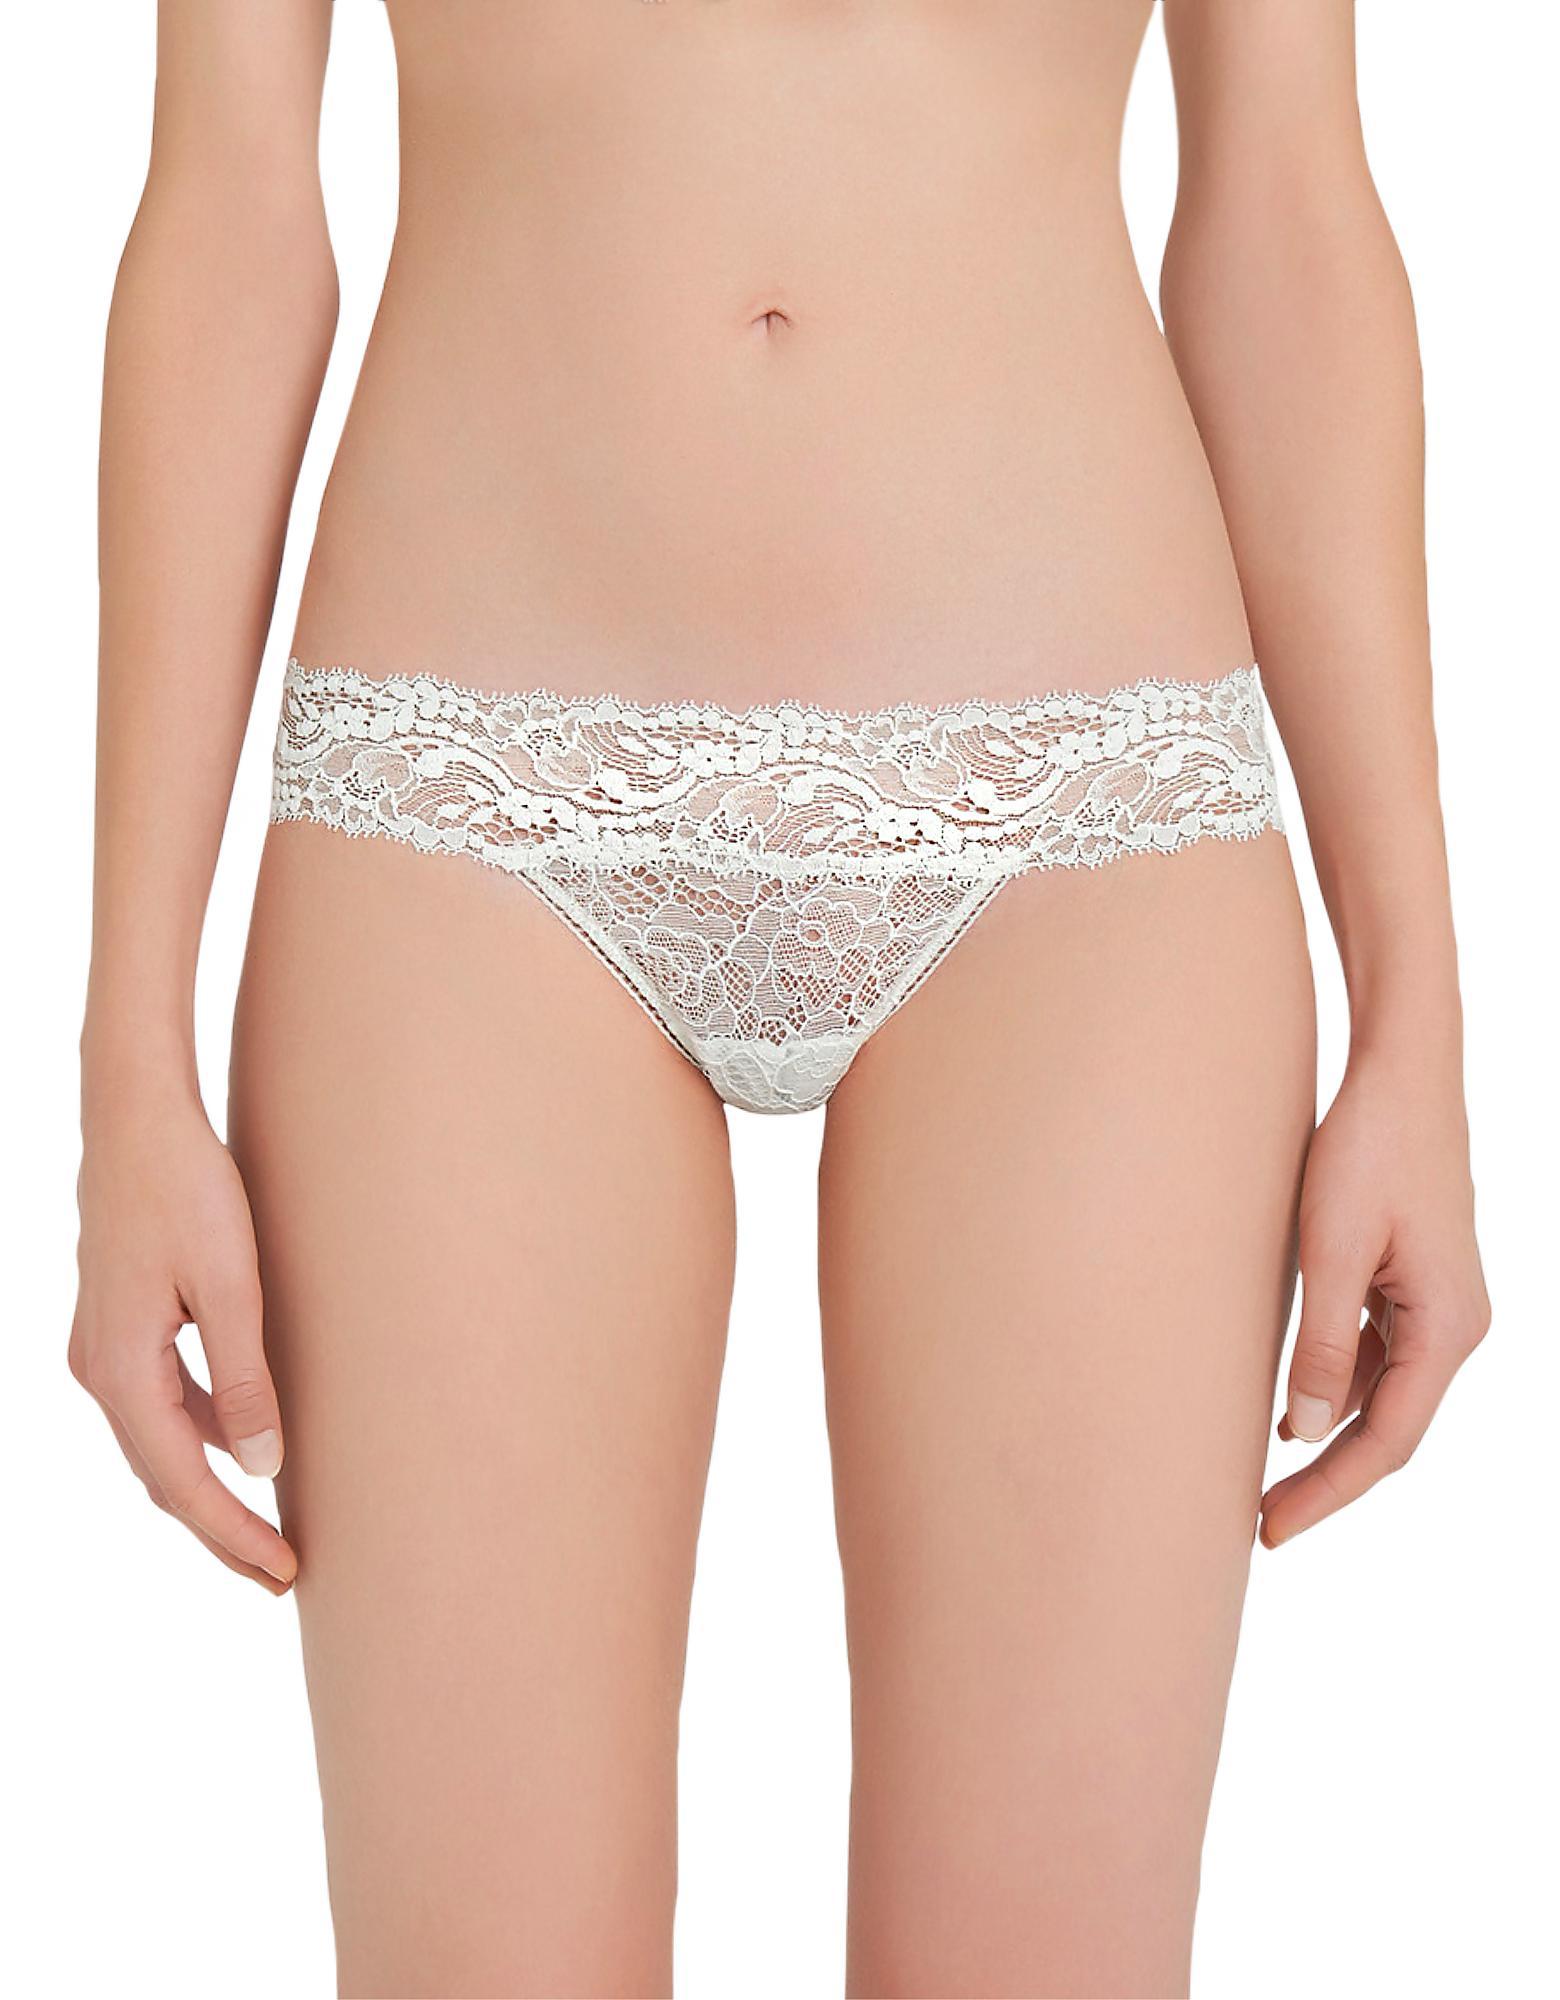 b67acab1ac0a Lyst - La Perla Freedom Stretch Leavers Lace Thong in White